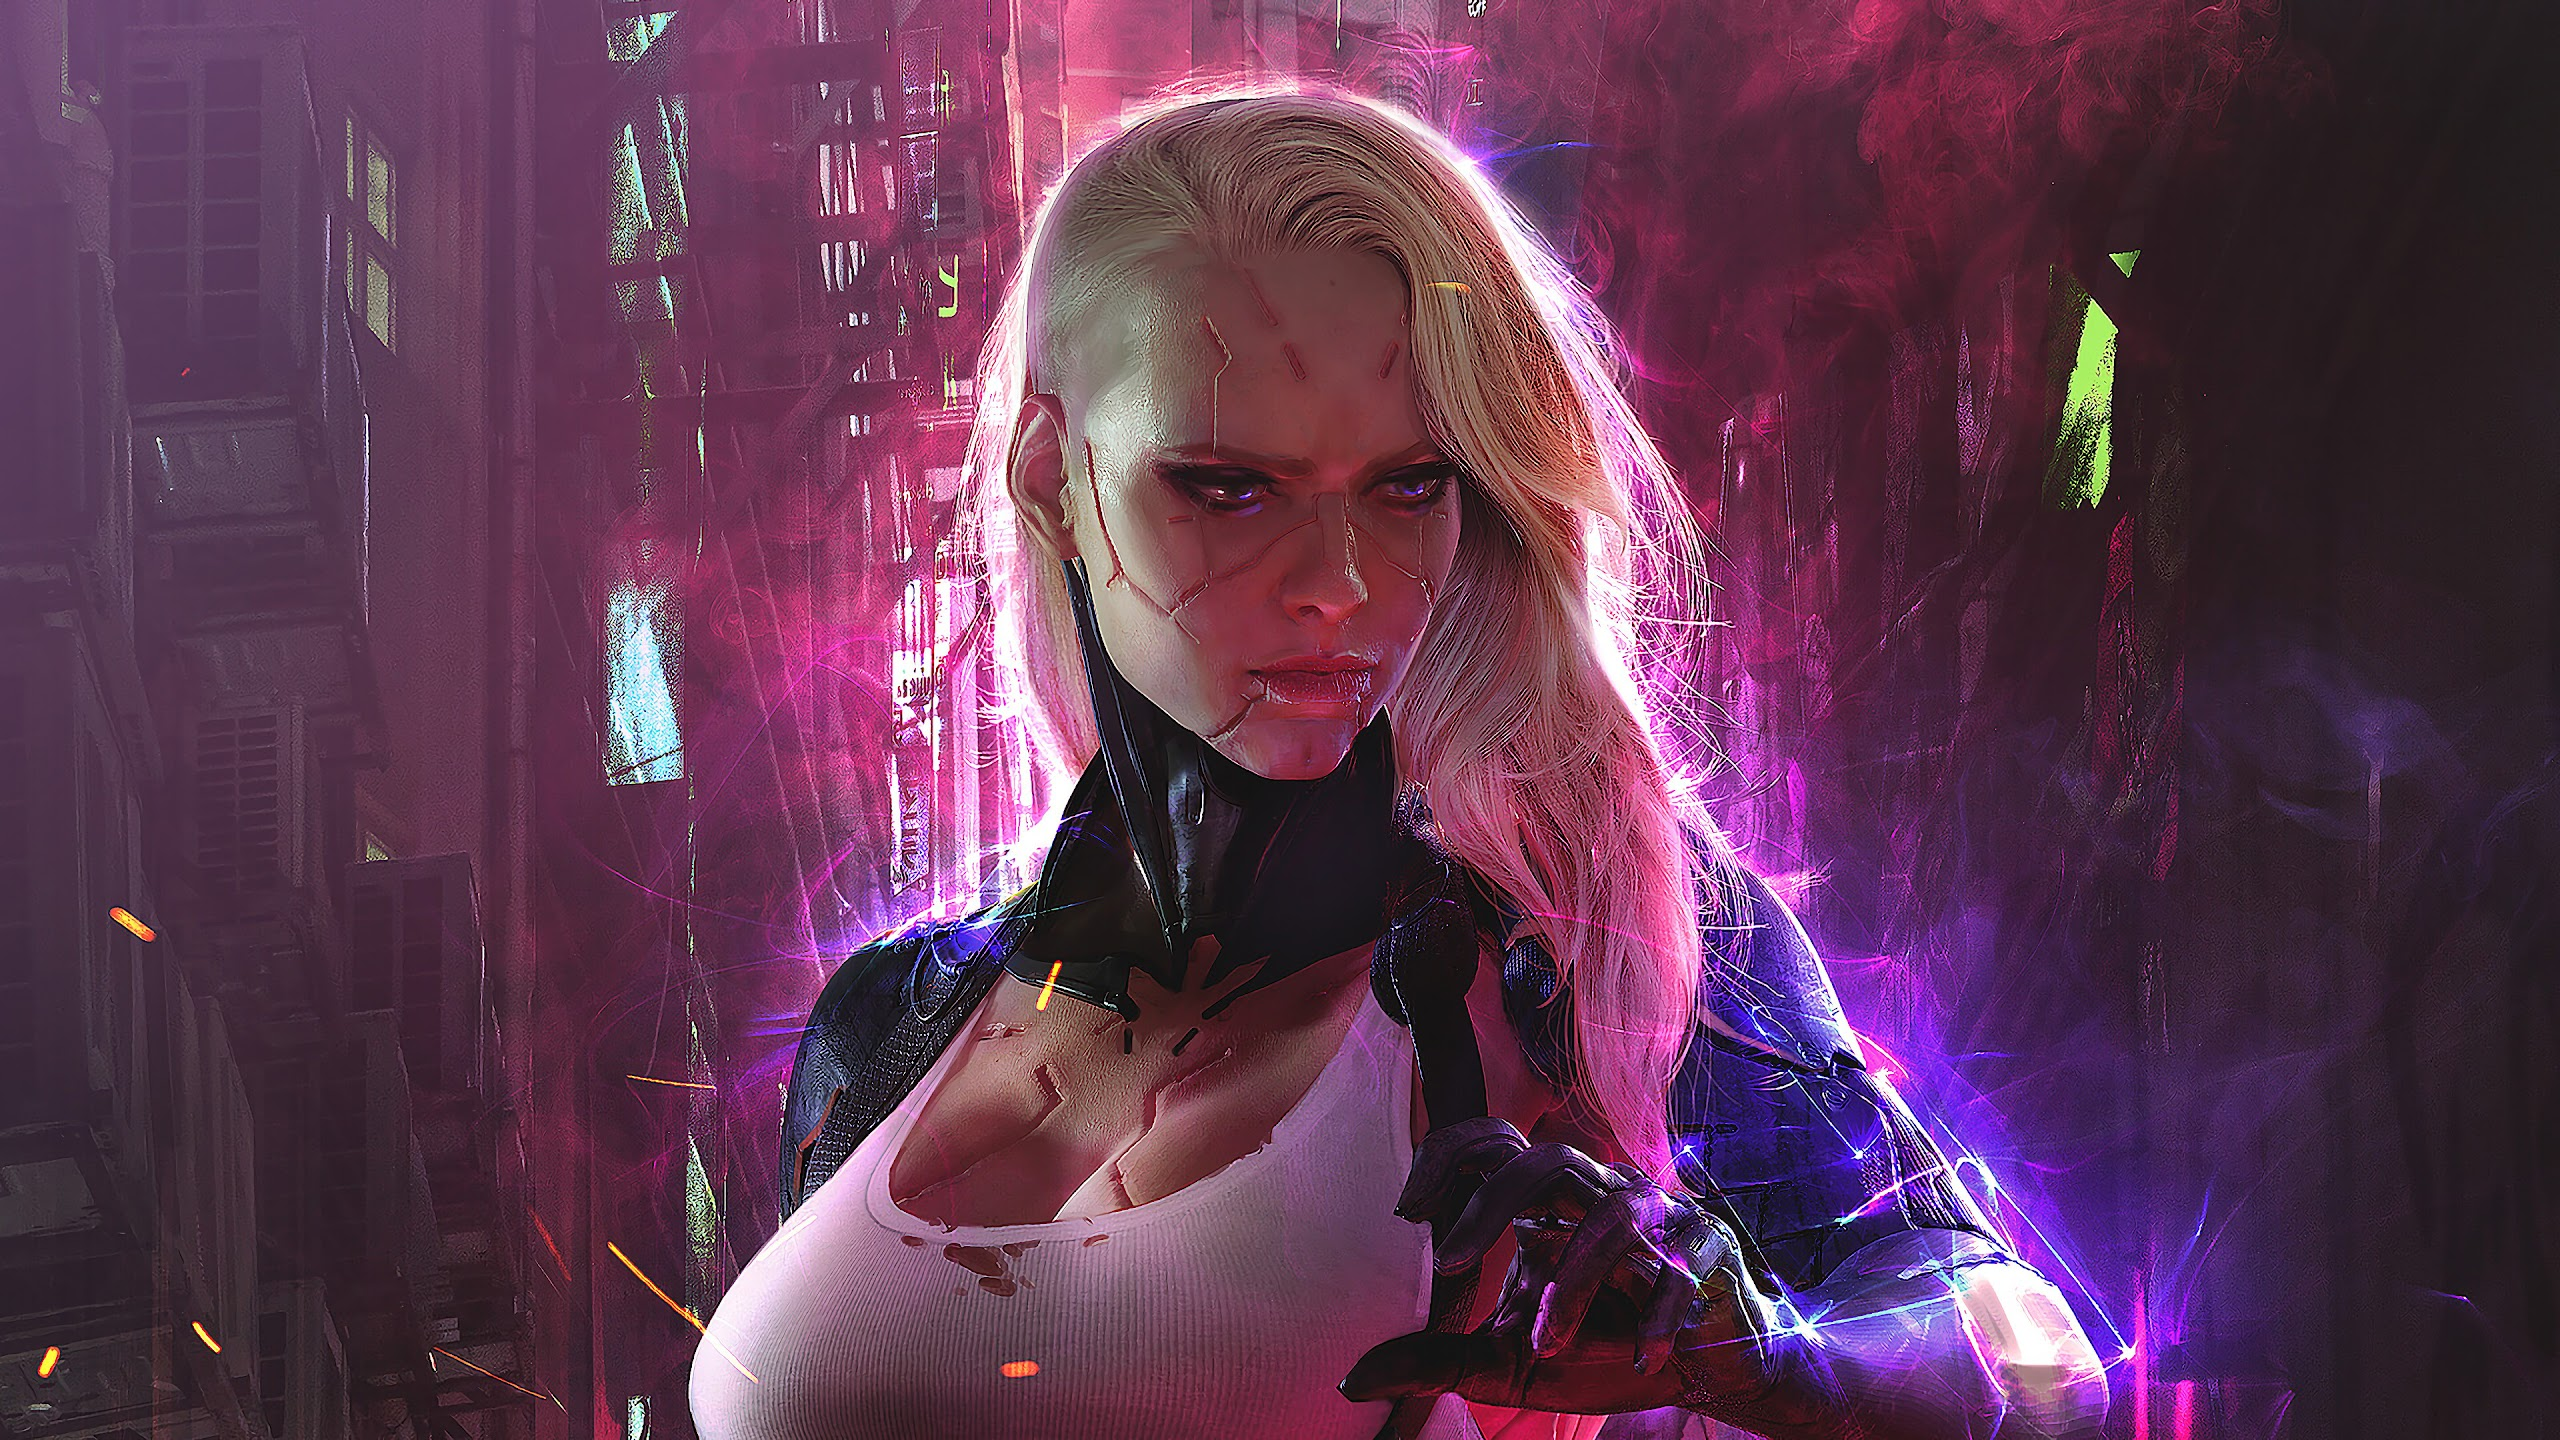 Encuentrele un nuevo cuerpo a Zöe Cyberpunk-girl-sci-fi-uhdpaper.com-4K-144